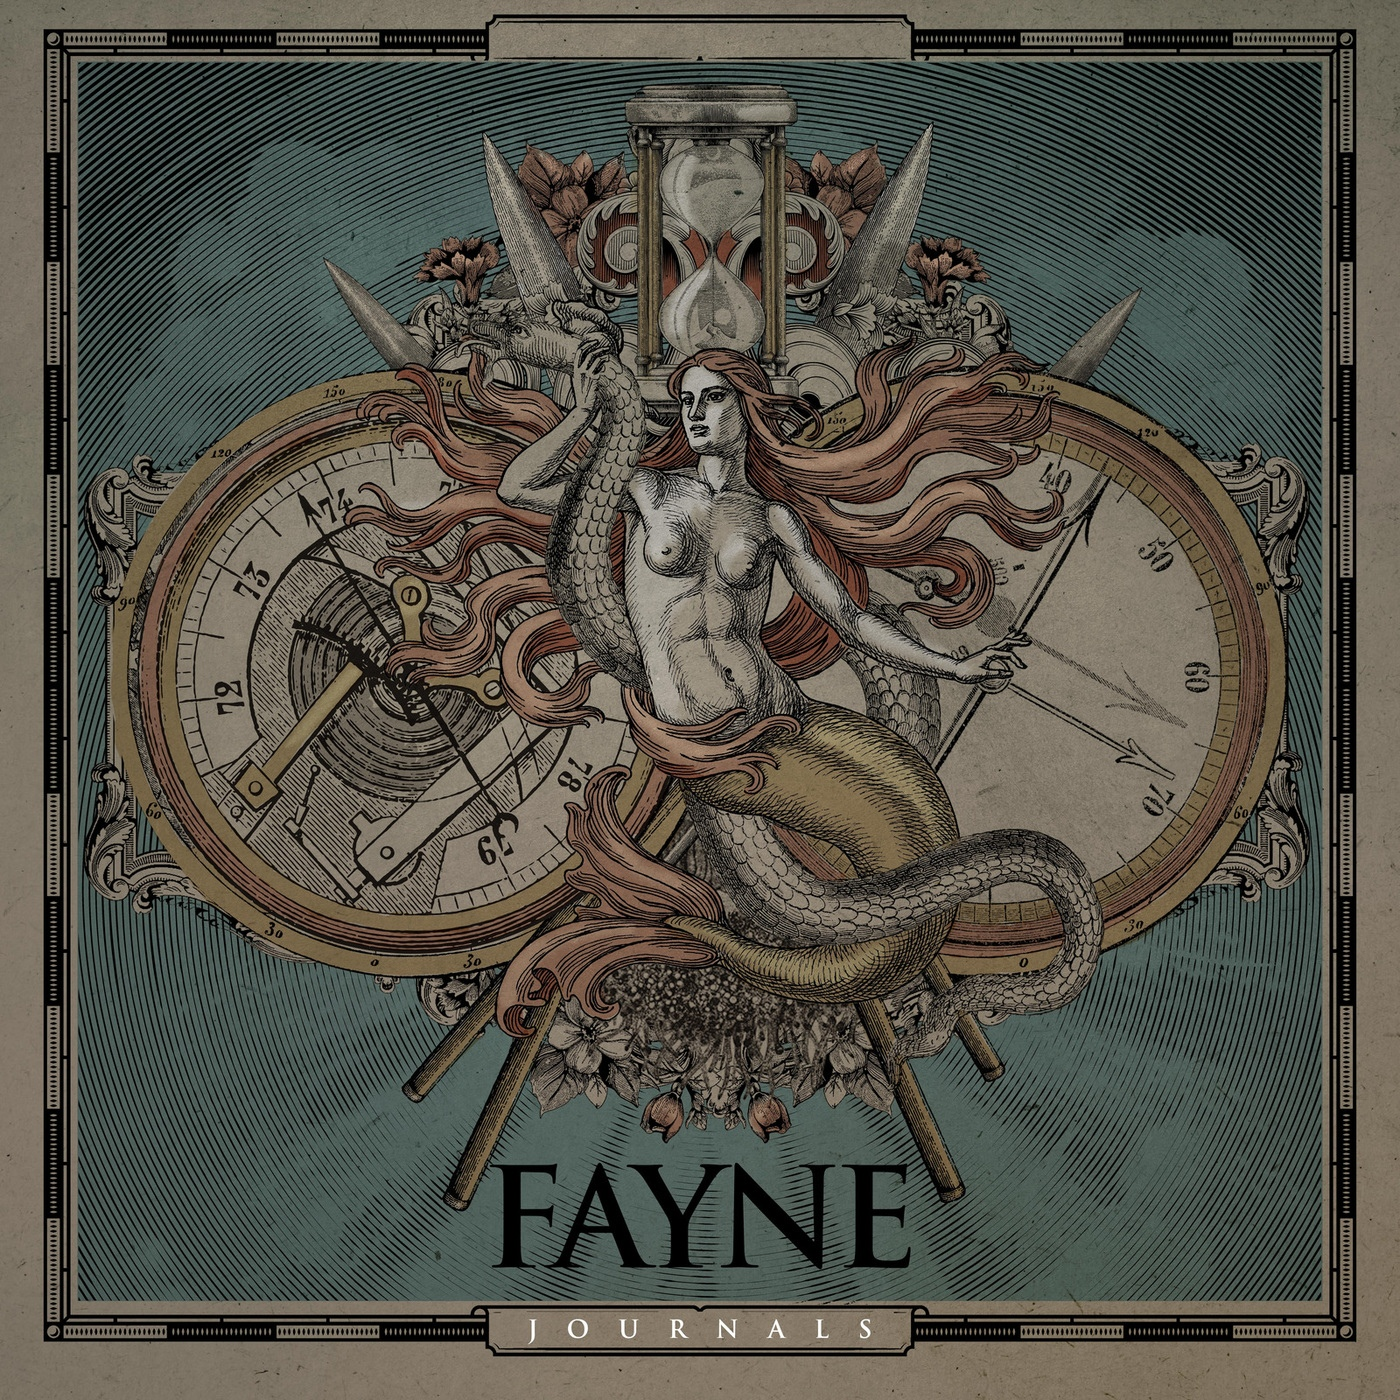 Fayne - Journals (2018)